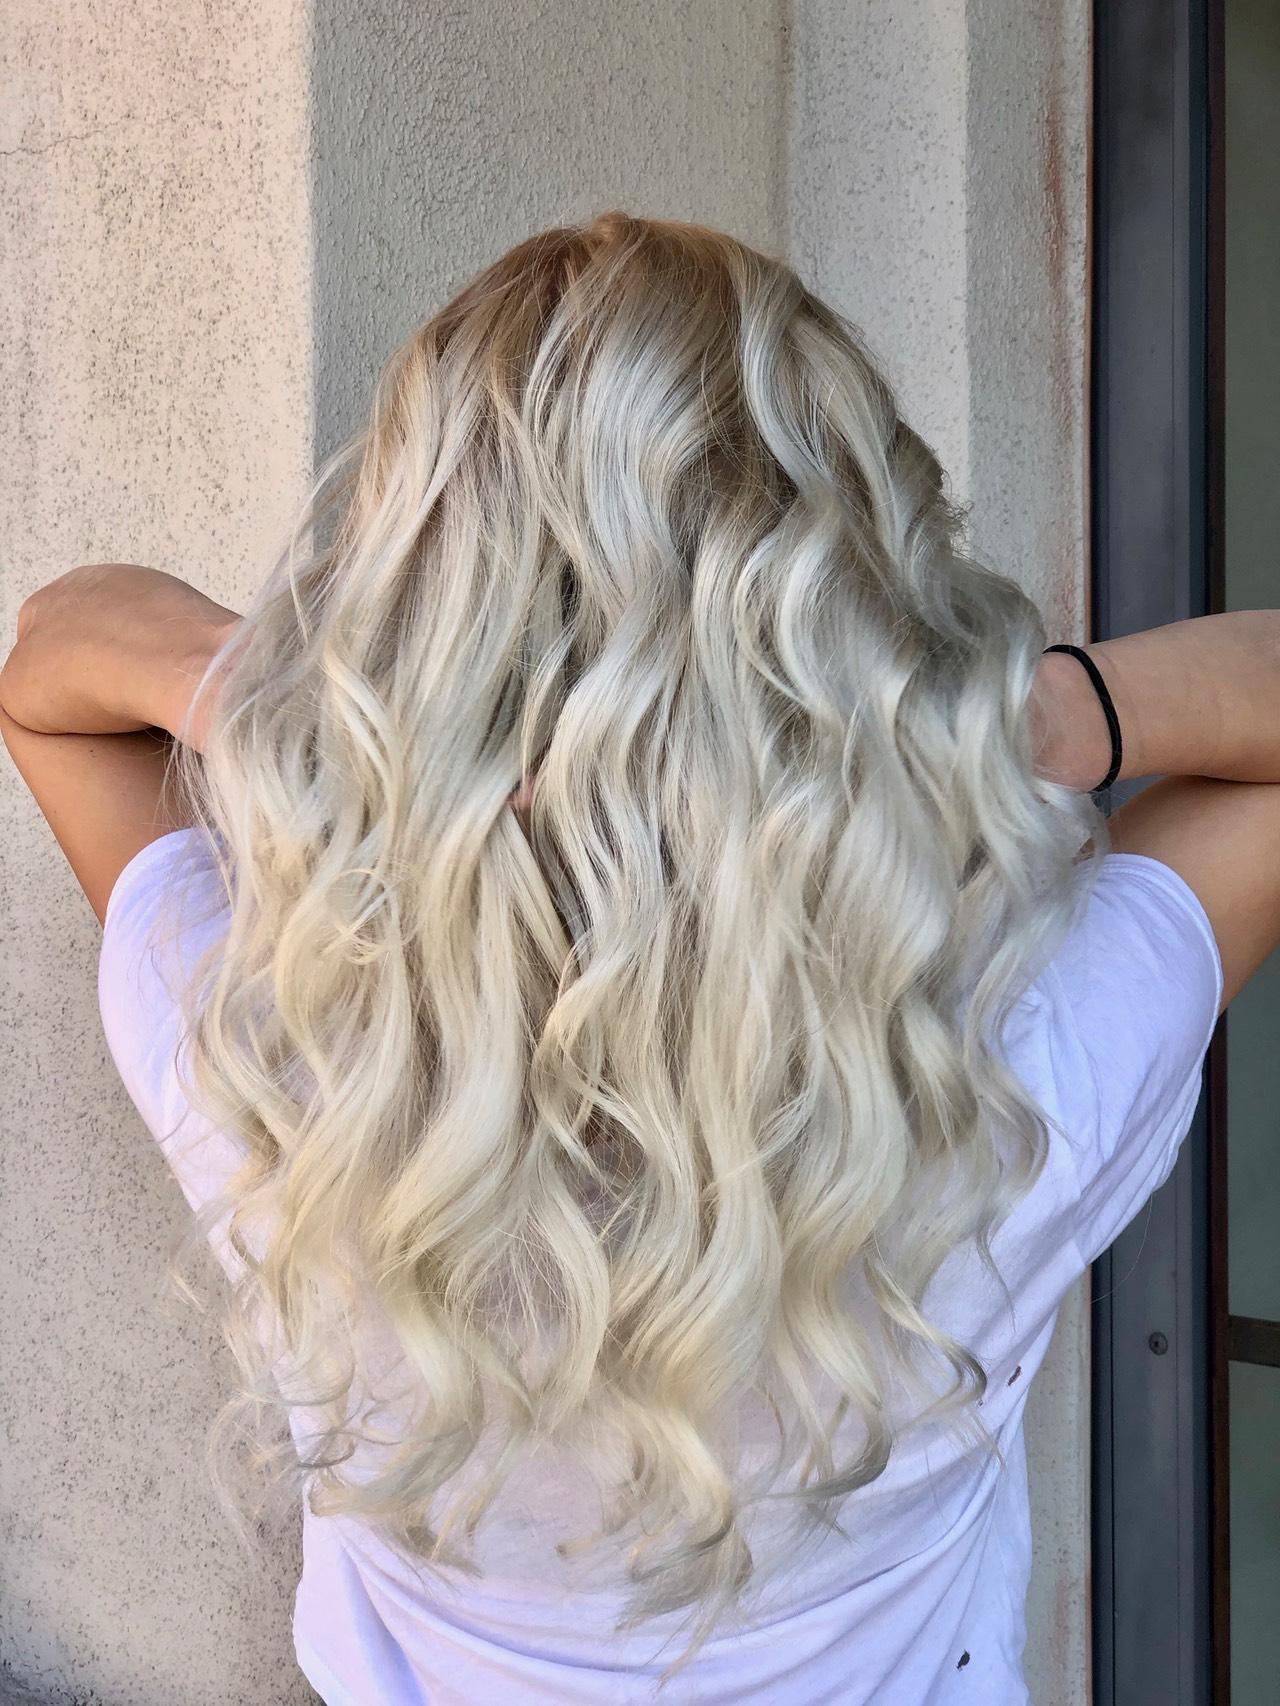 The Brighter Ideas Of Hair Color Haircolor Correction